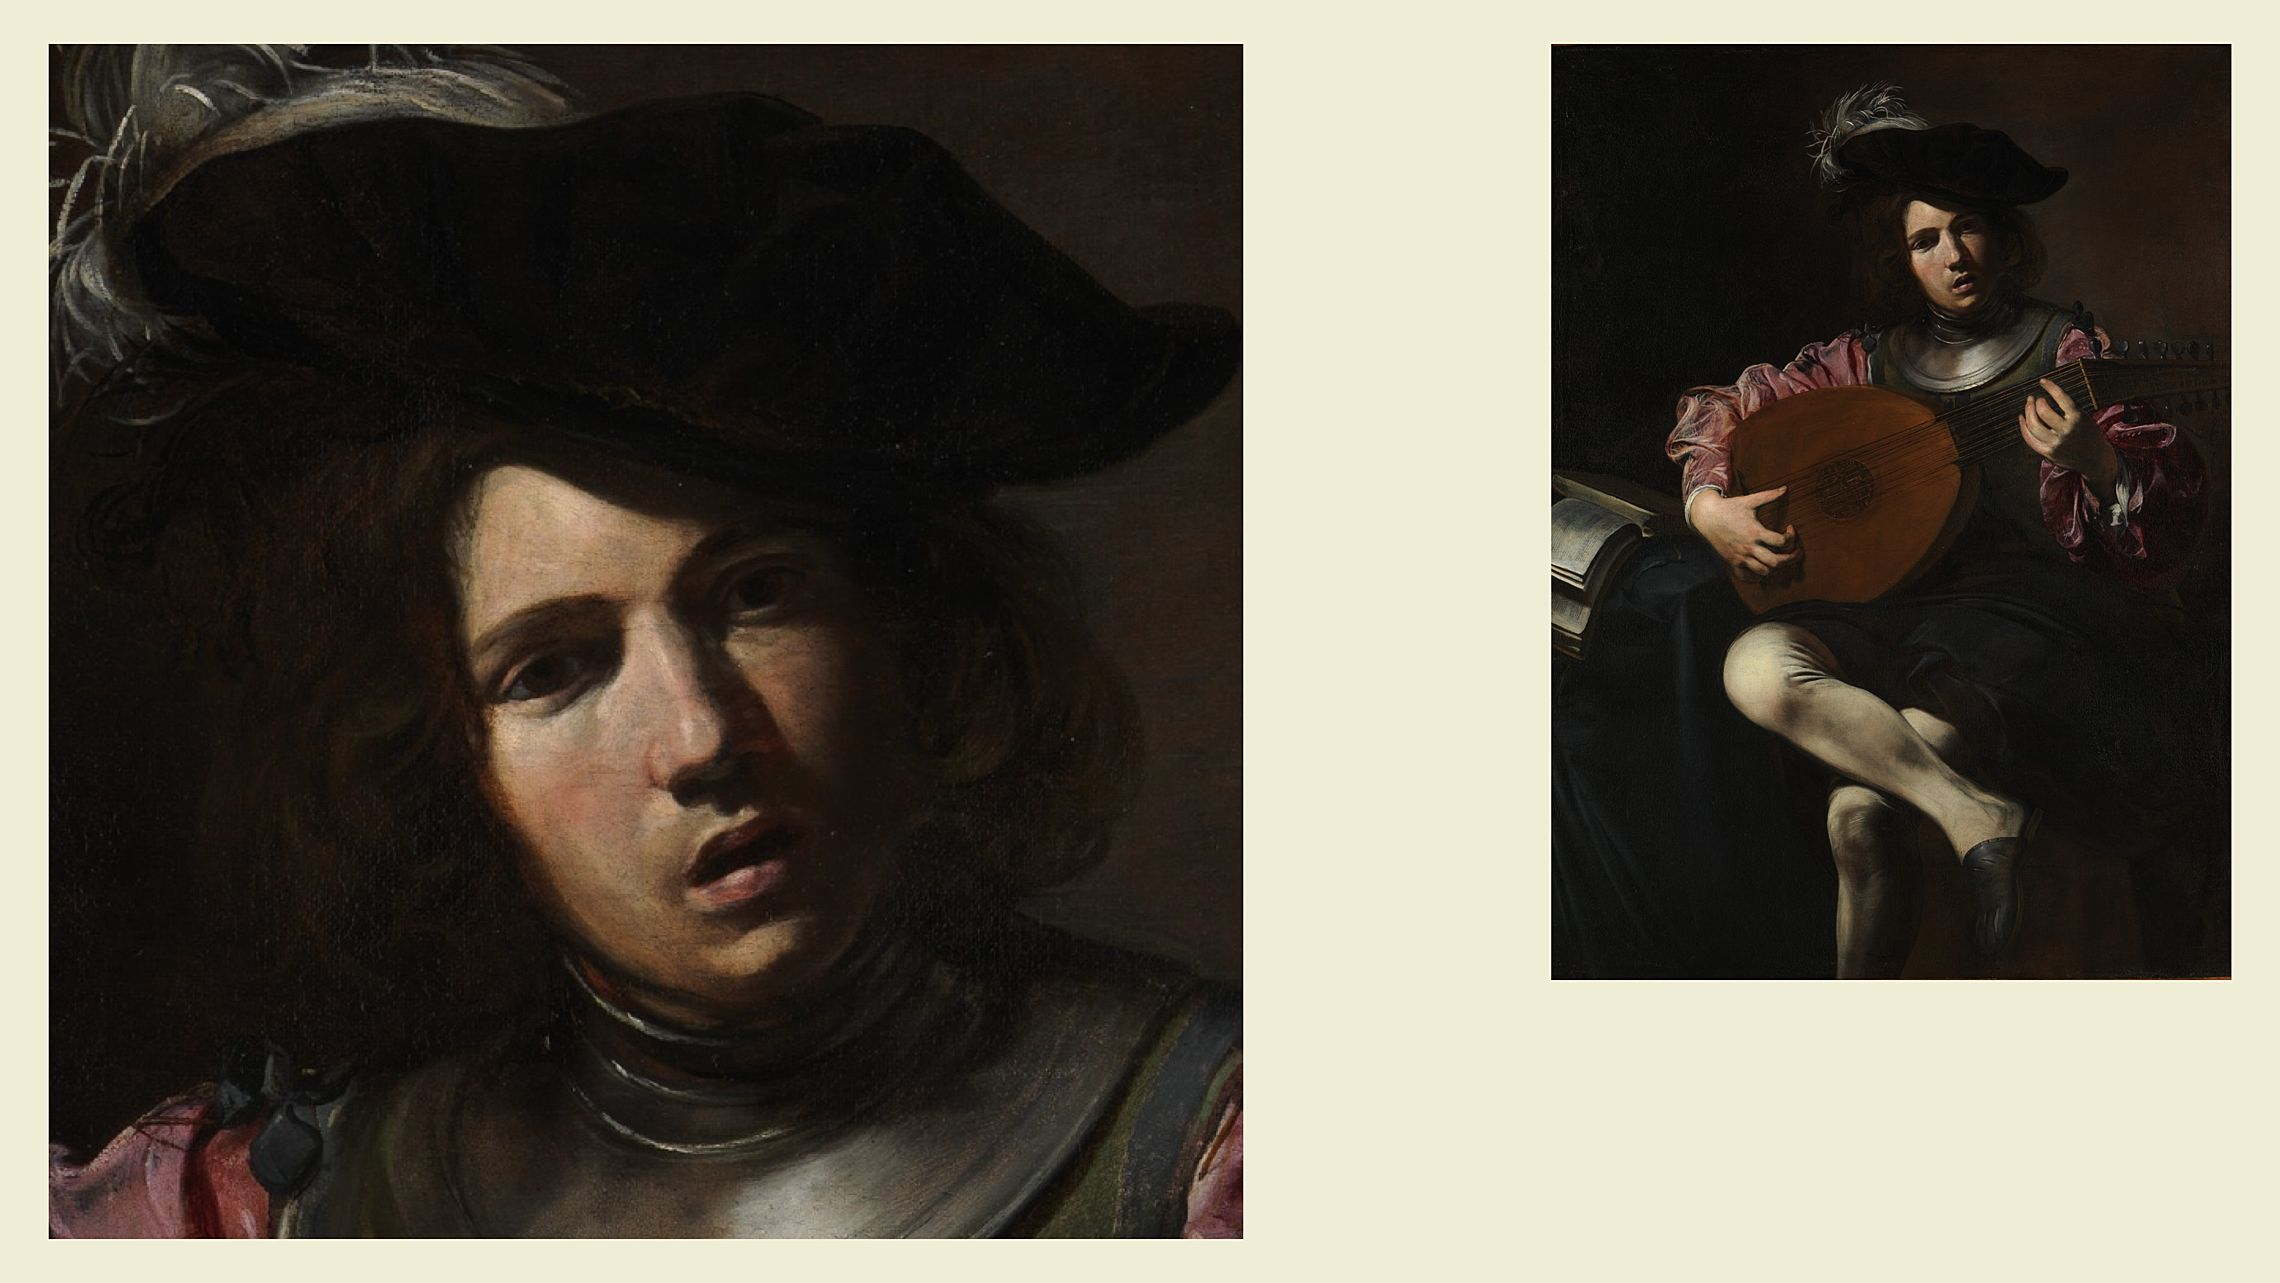 Валантен де Булонь. «Лютнист», ок. 1625–1626. Из коллекции Метрополитен-музея